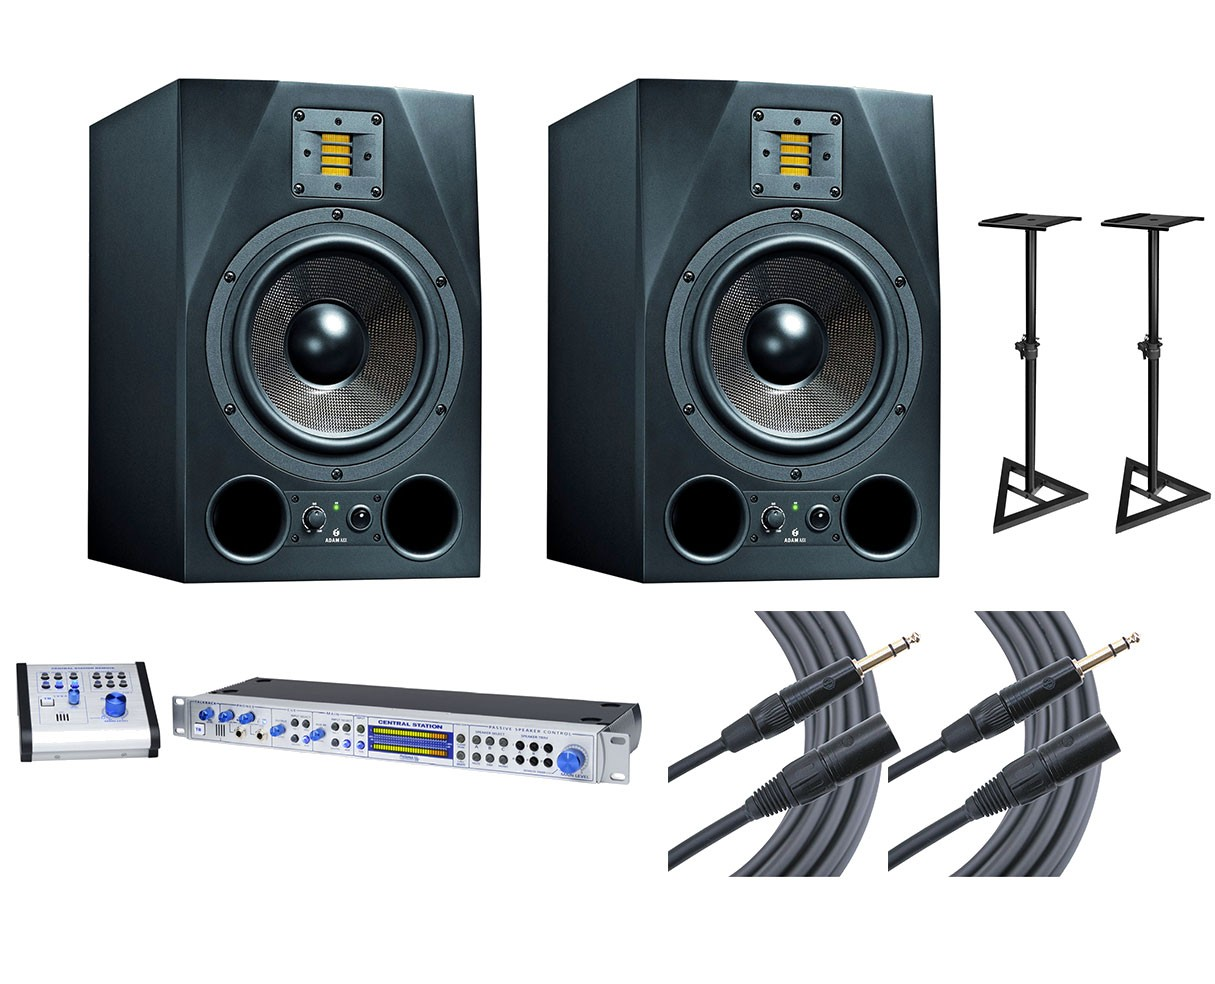 2x ADAM A8X + Central Station PLUS + Stands + Mogami Cables